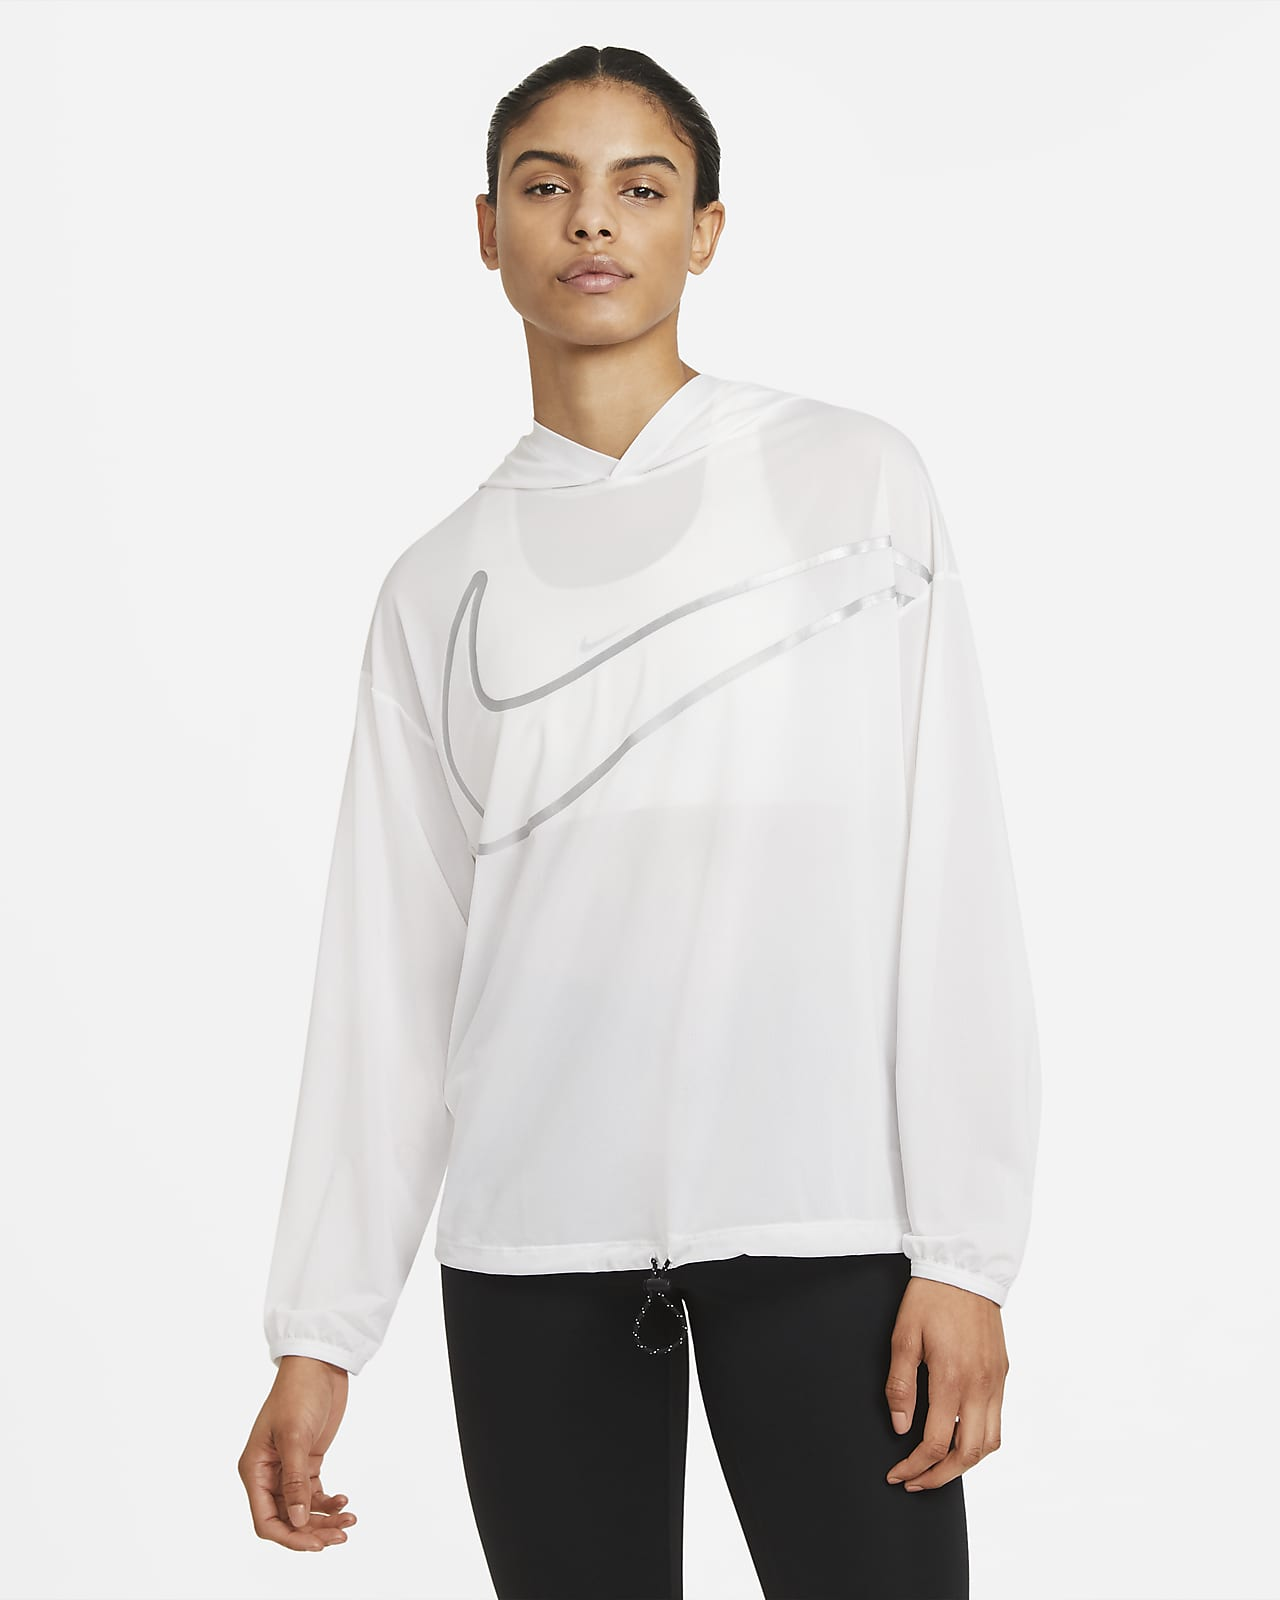 Sudadera con gorro con gráfico para mujer Nike Pro Collection